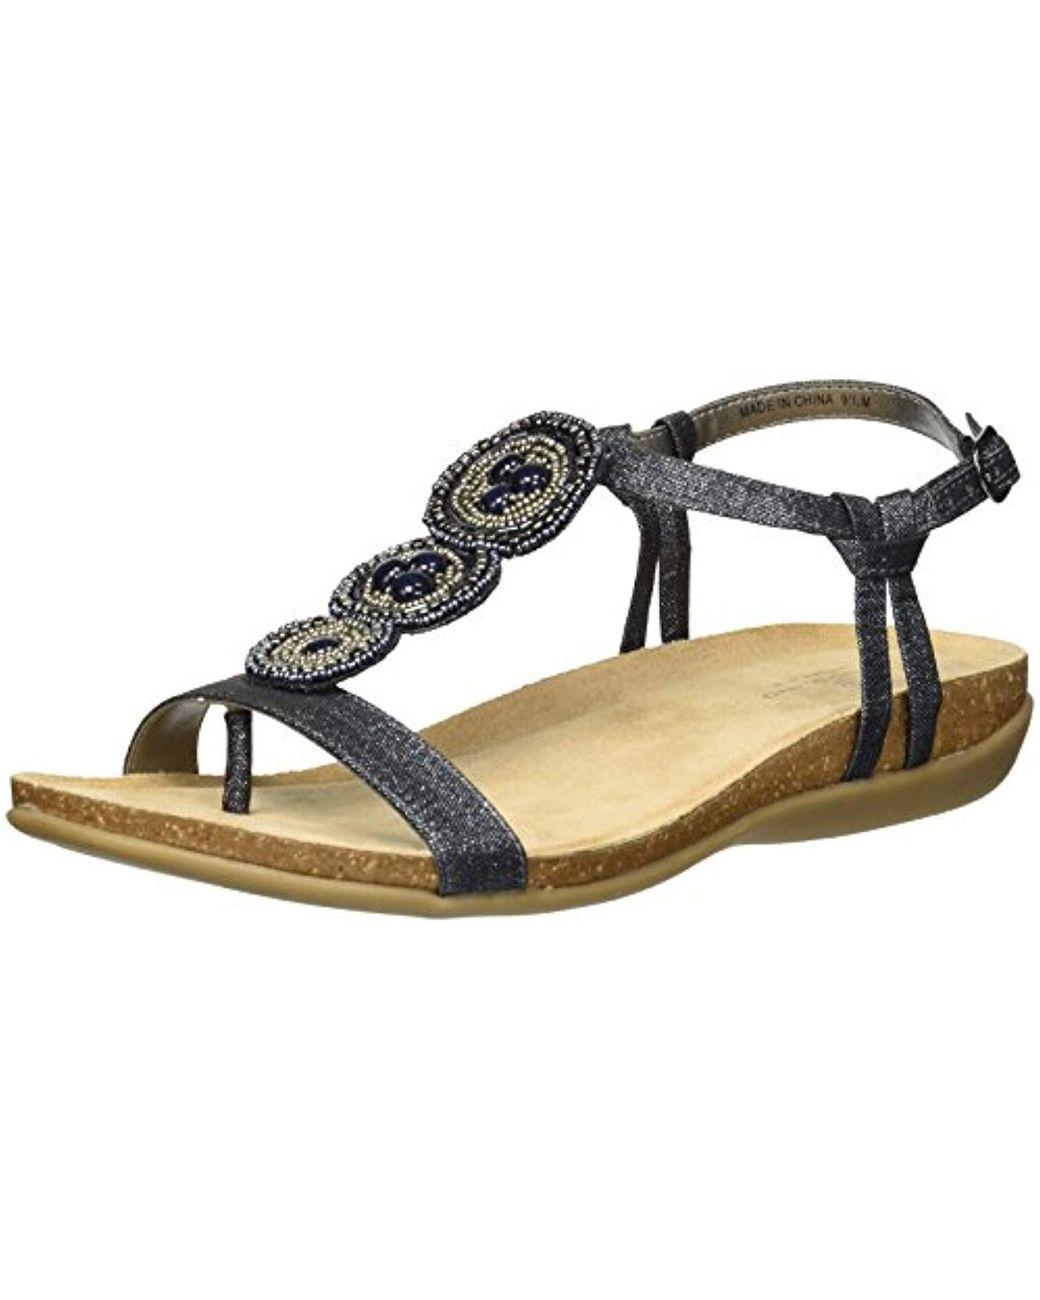 Medium Brown Bandolino Hamper Beaded Front Flat Sandals